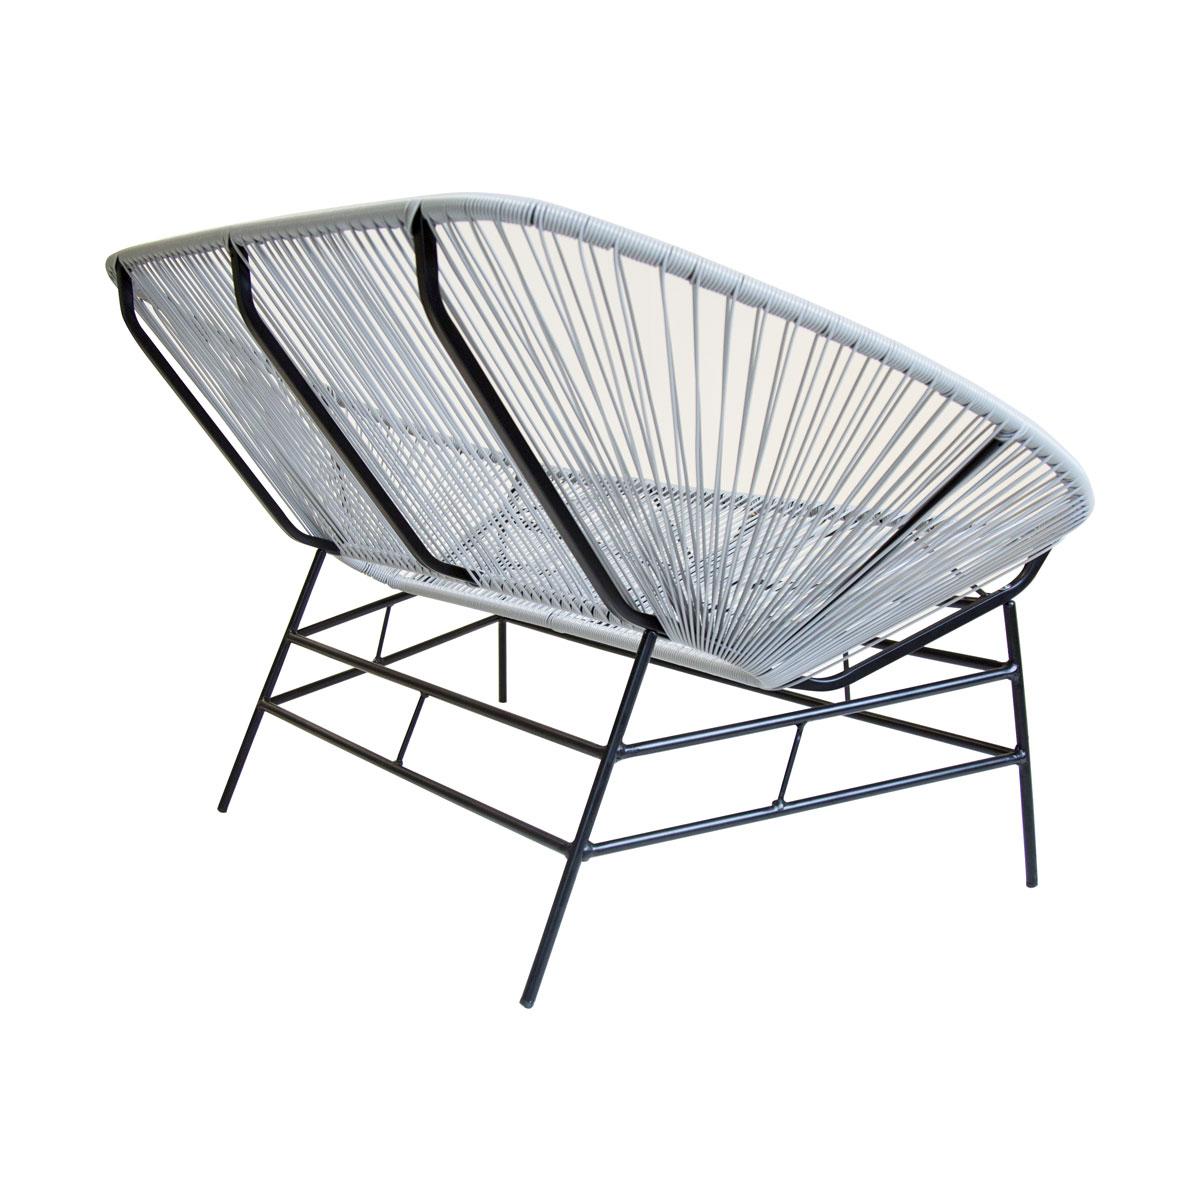 Charles Bentley Garden Furniture Retro Rattan Lounge Bench - Grey ...